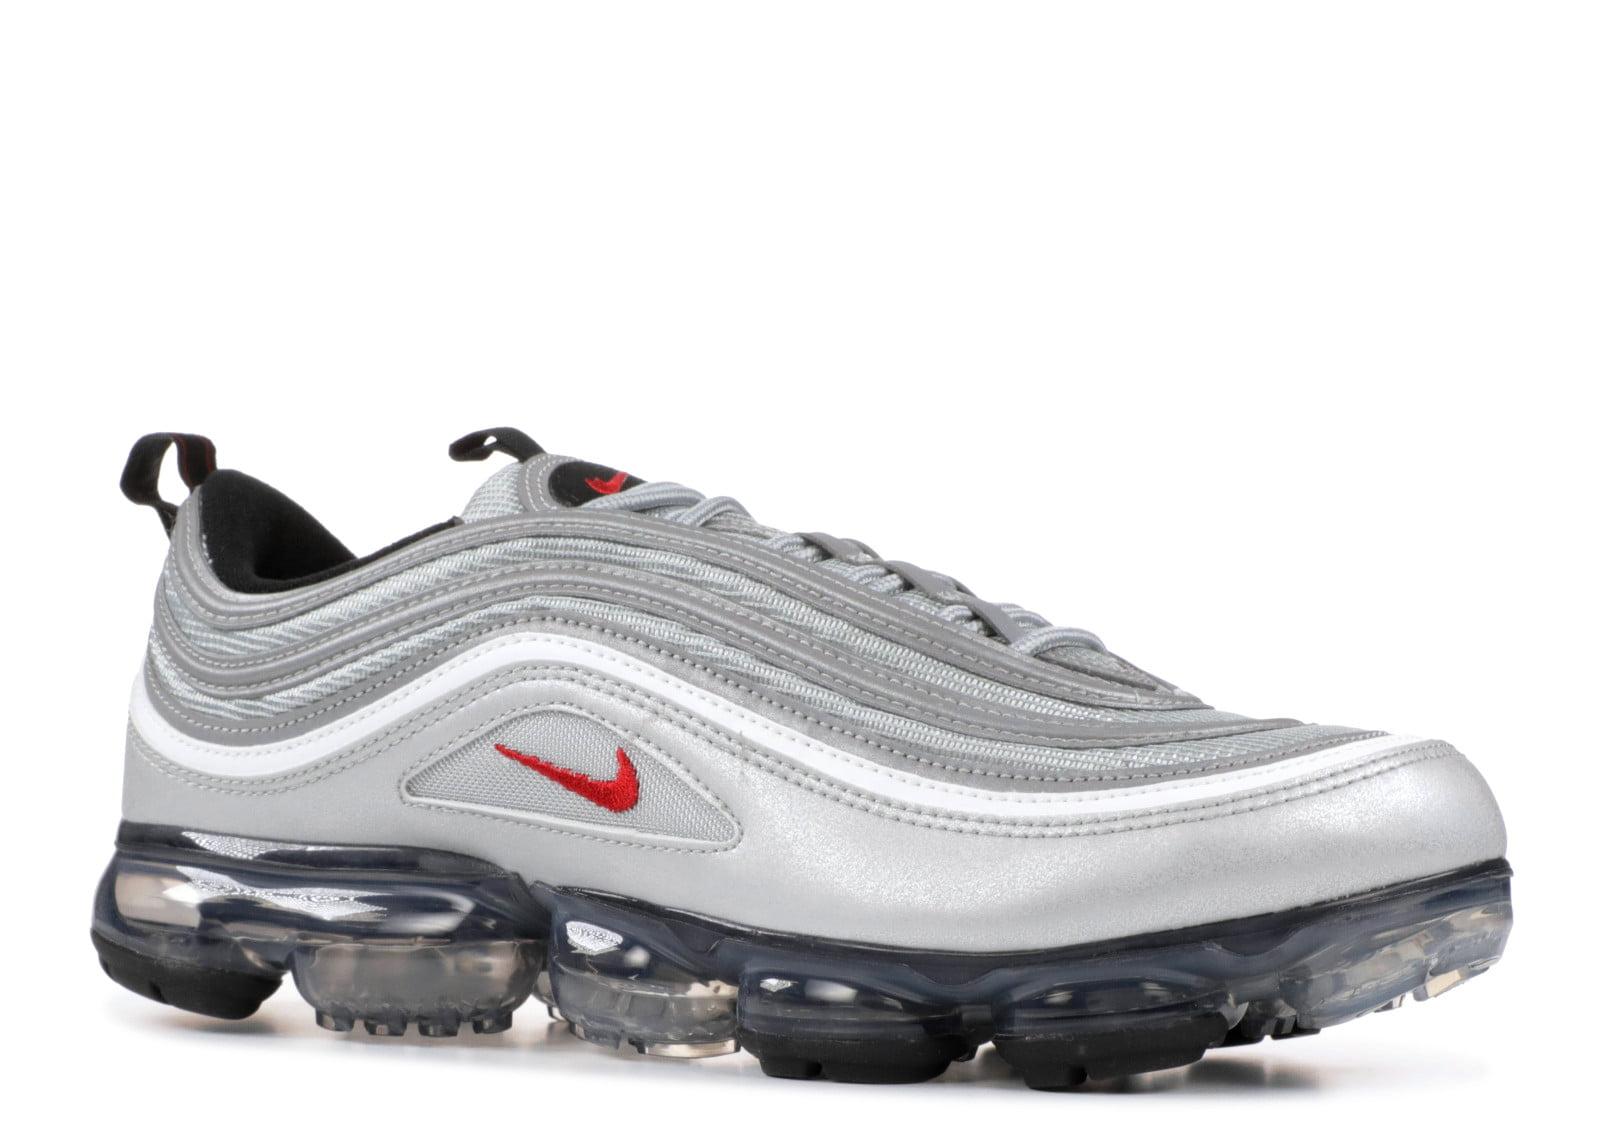 lowest price 12d6b 63aca Nike - Men - Air Vapormax 97 'Silver Bullet' - Aj7291-002 - Size 8.5